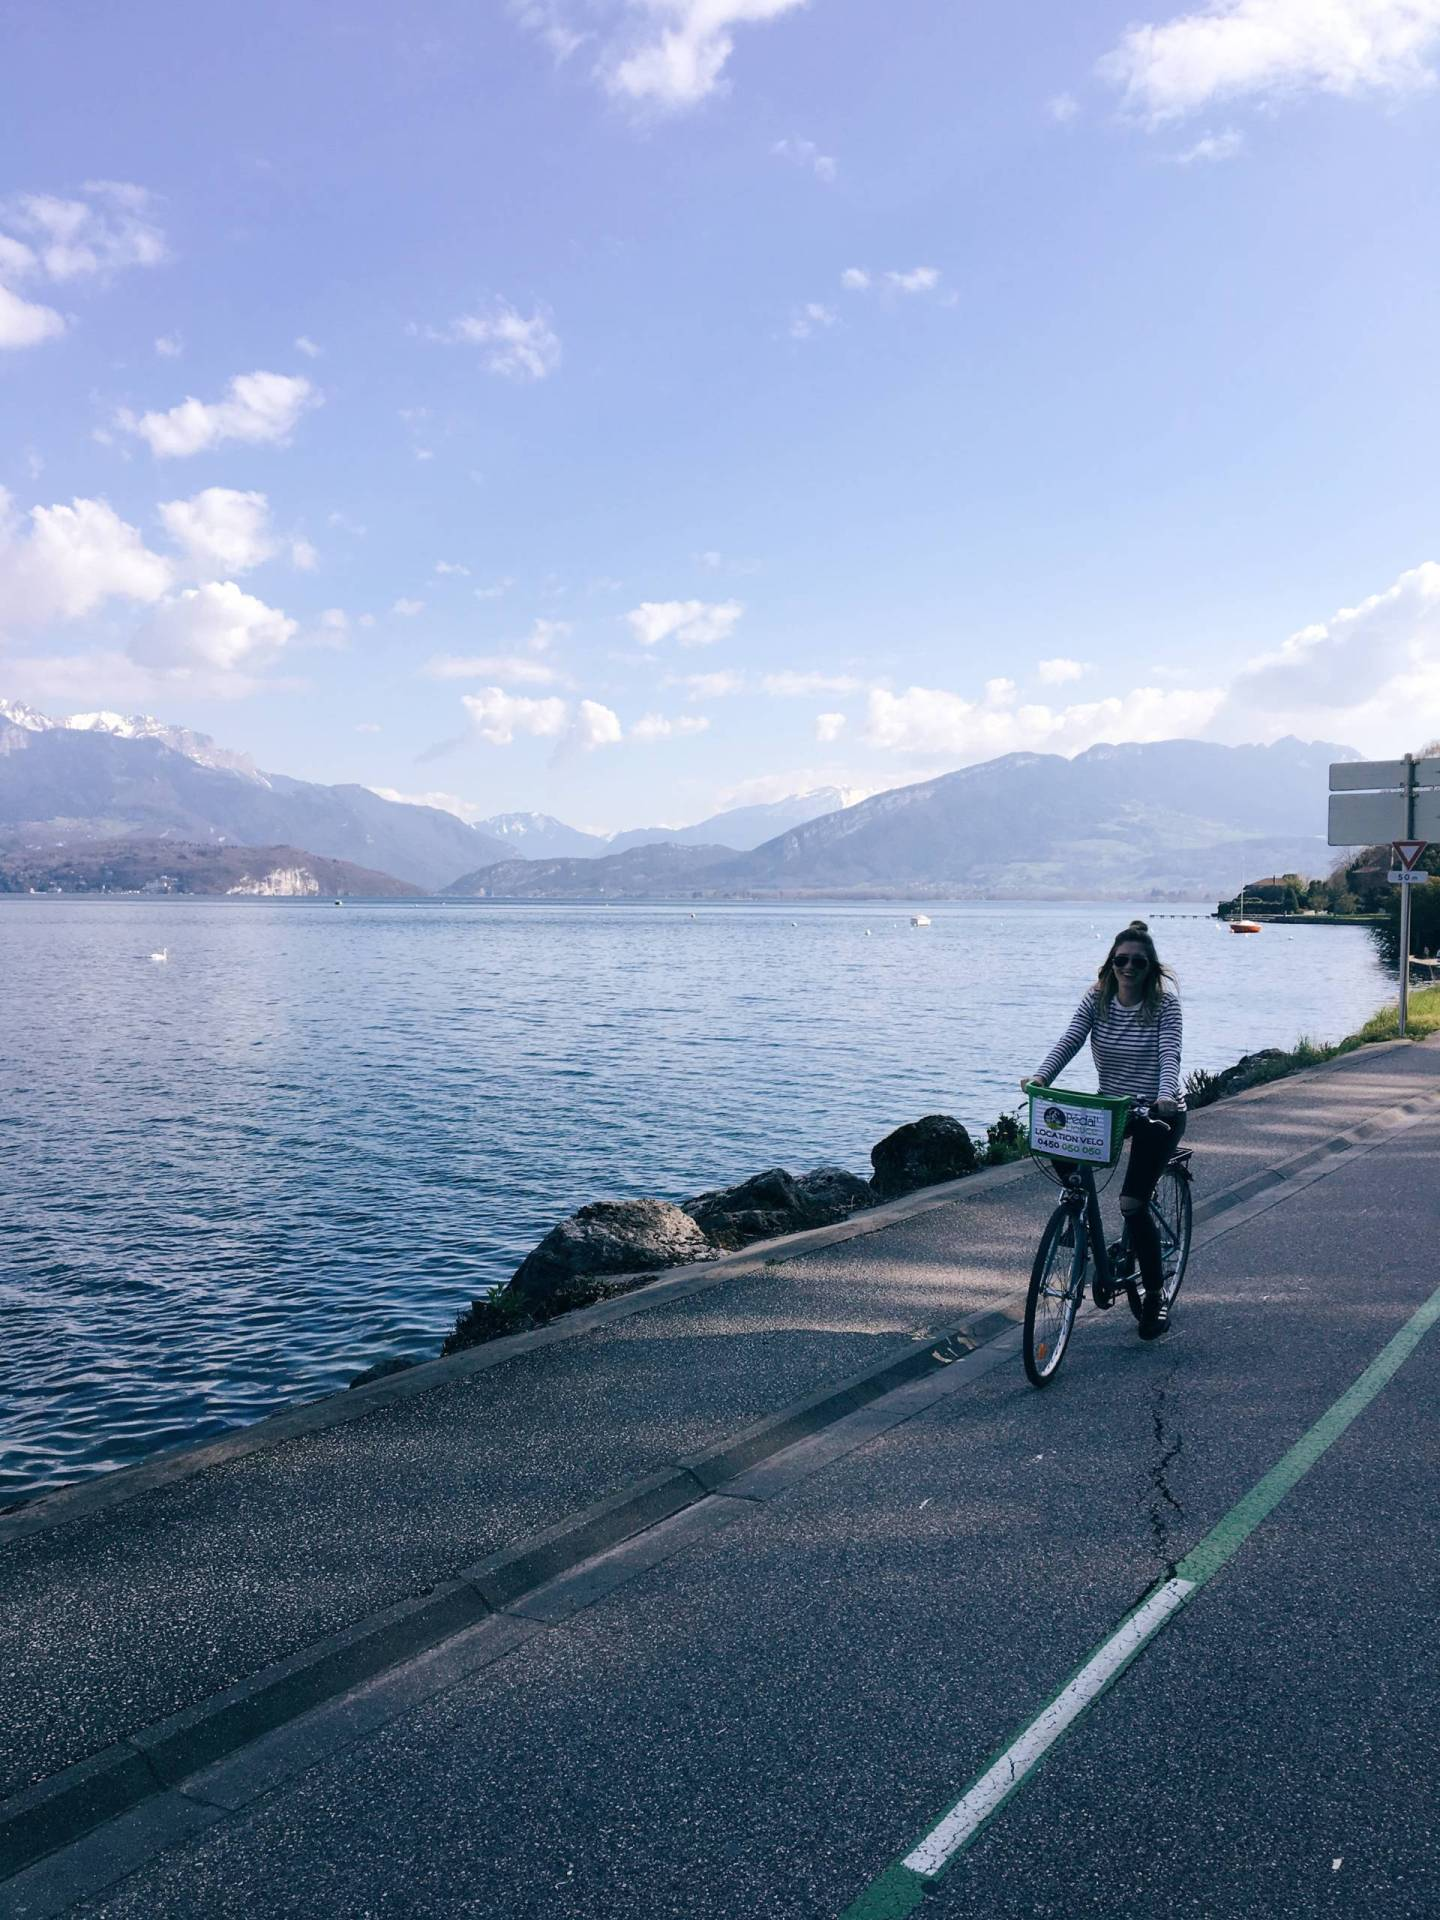 Riding Bikes around Lake Annecy